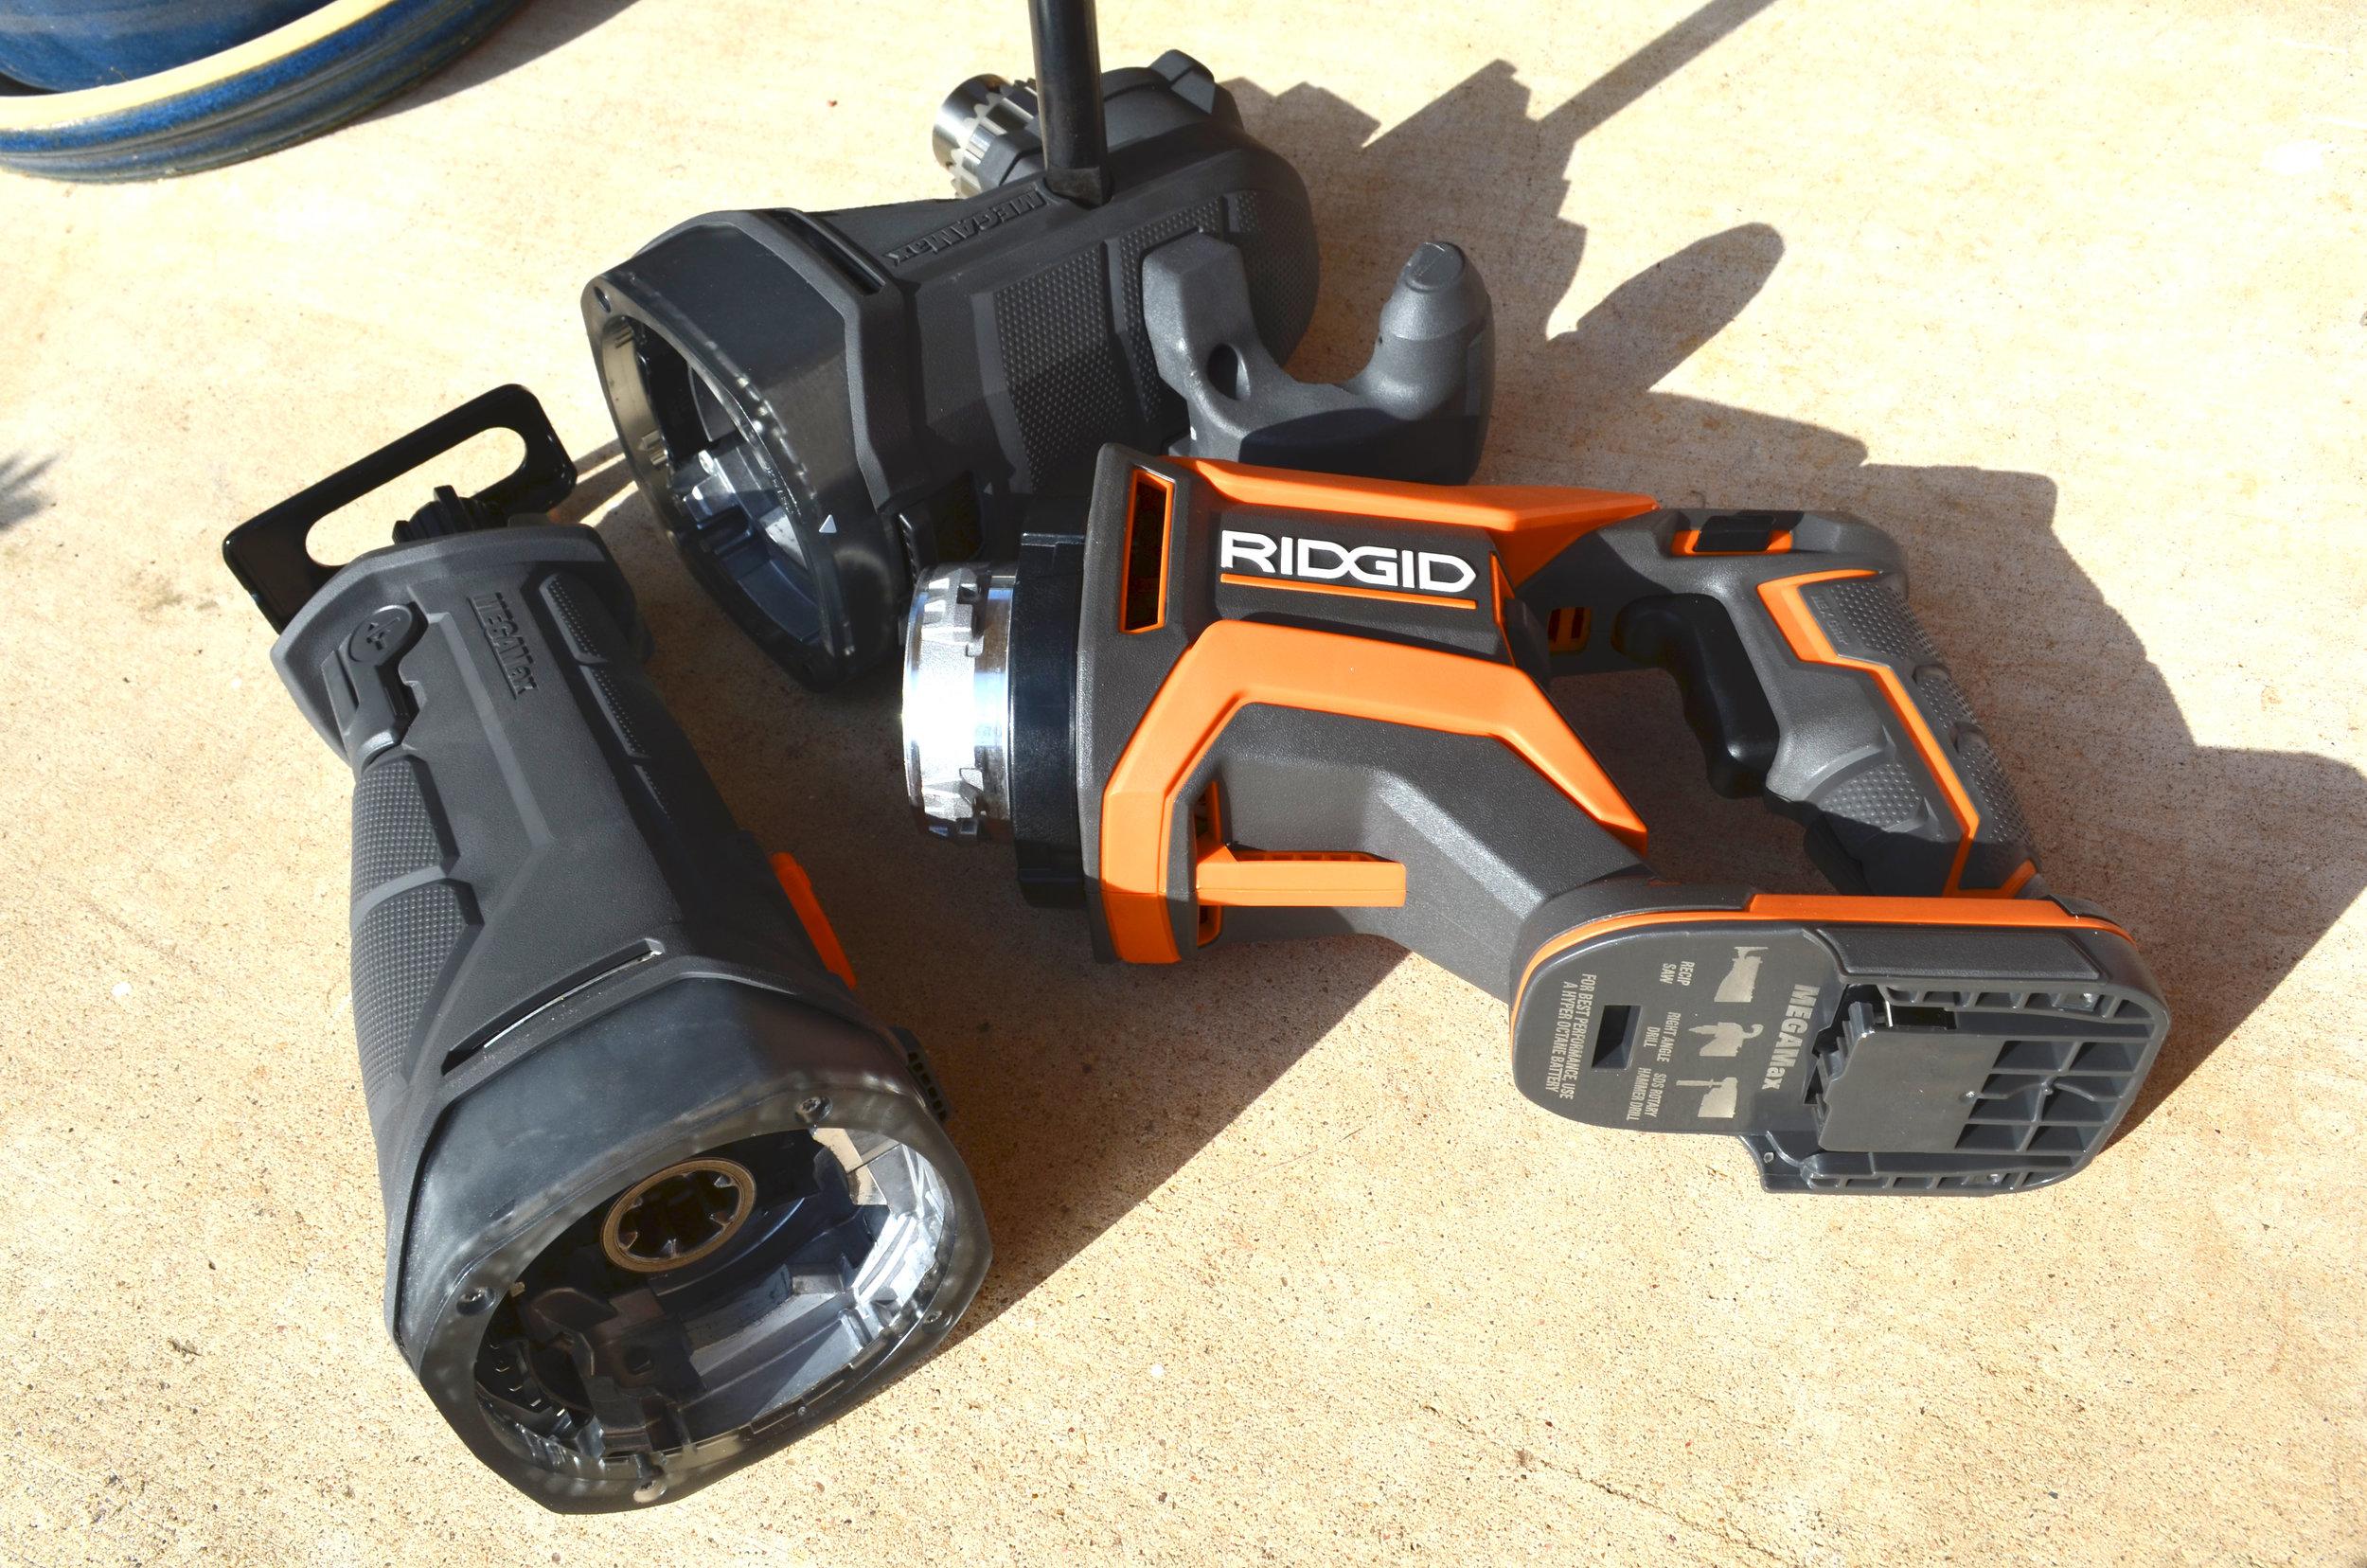 ridgid-megamax-with-attachments.jpg